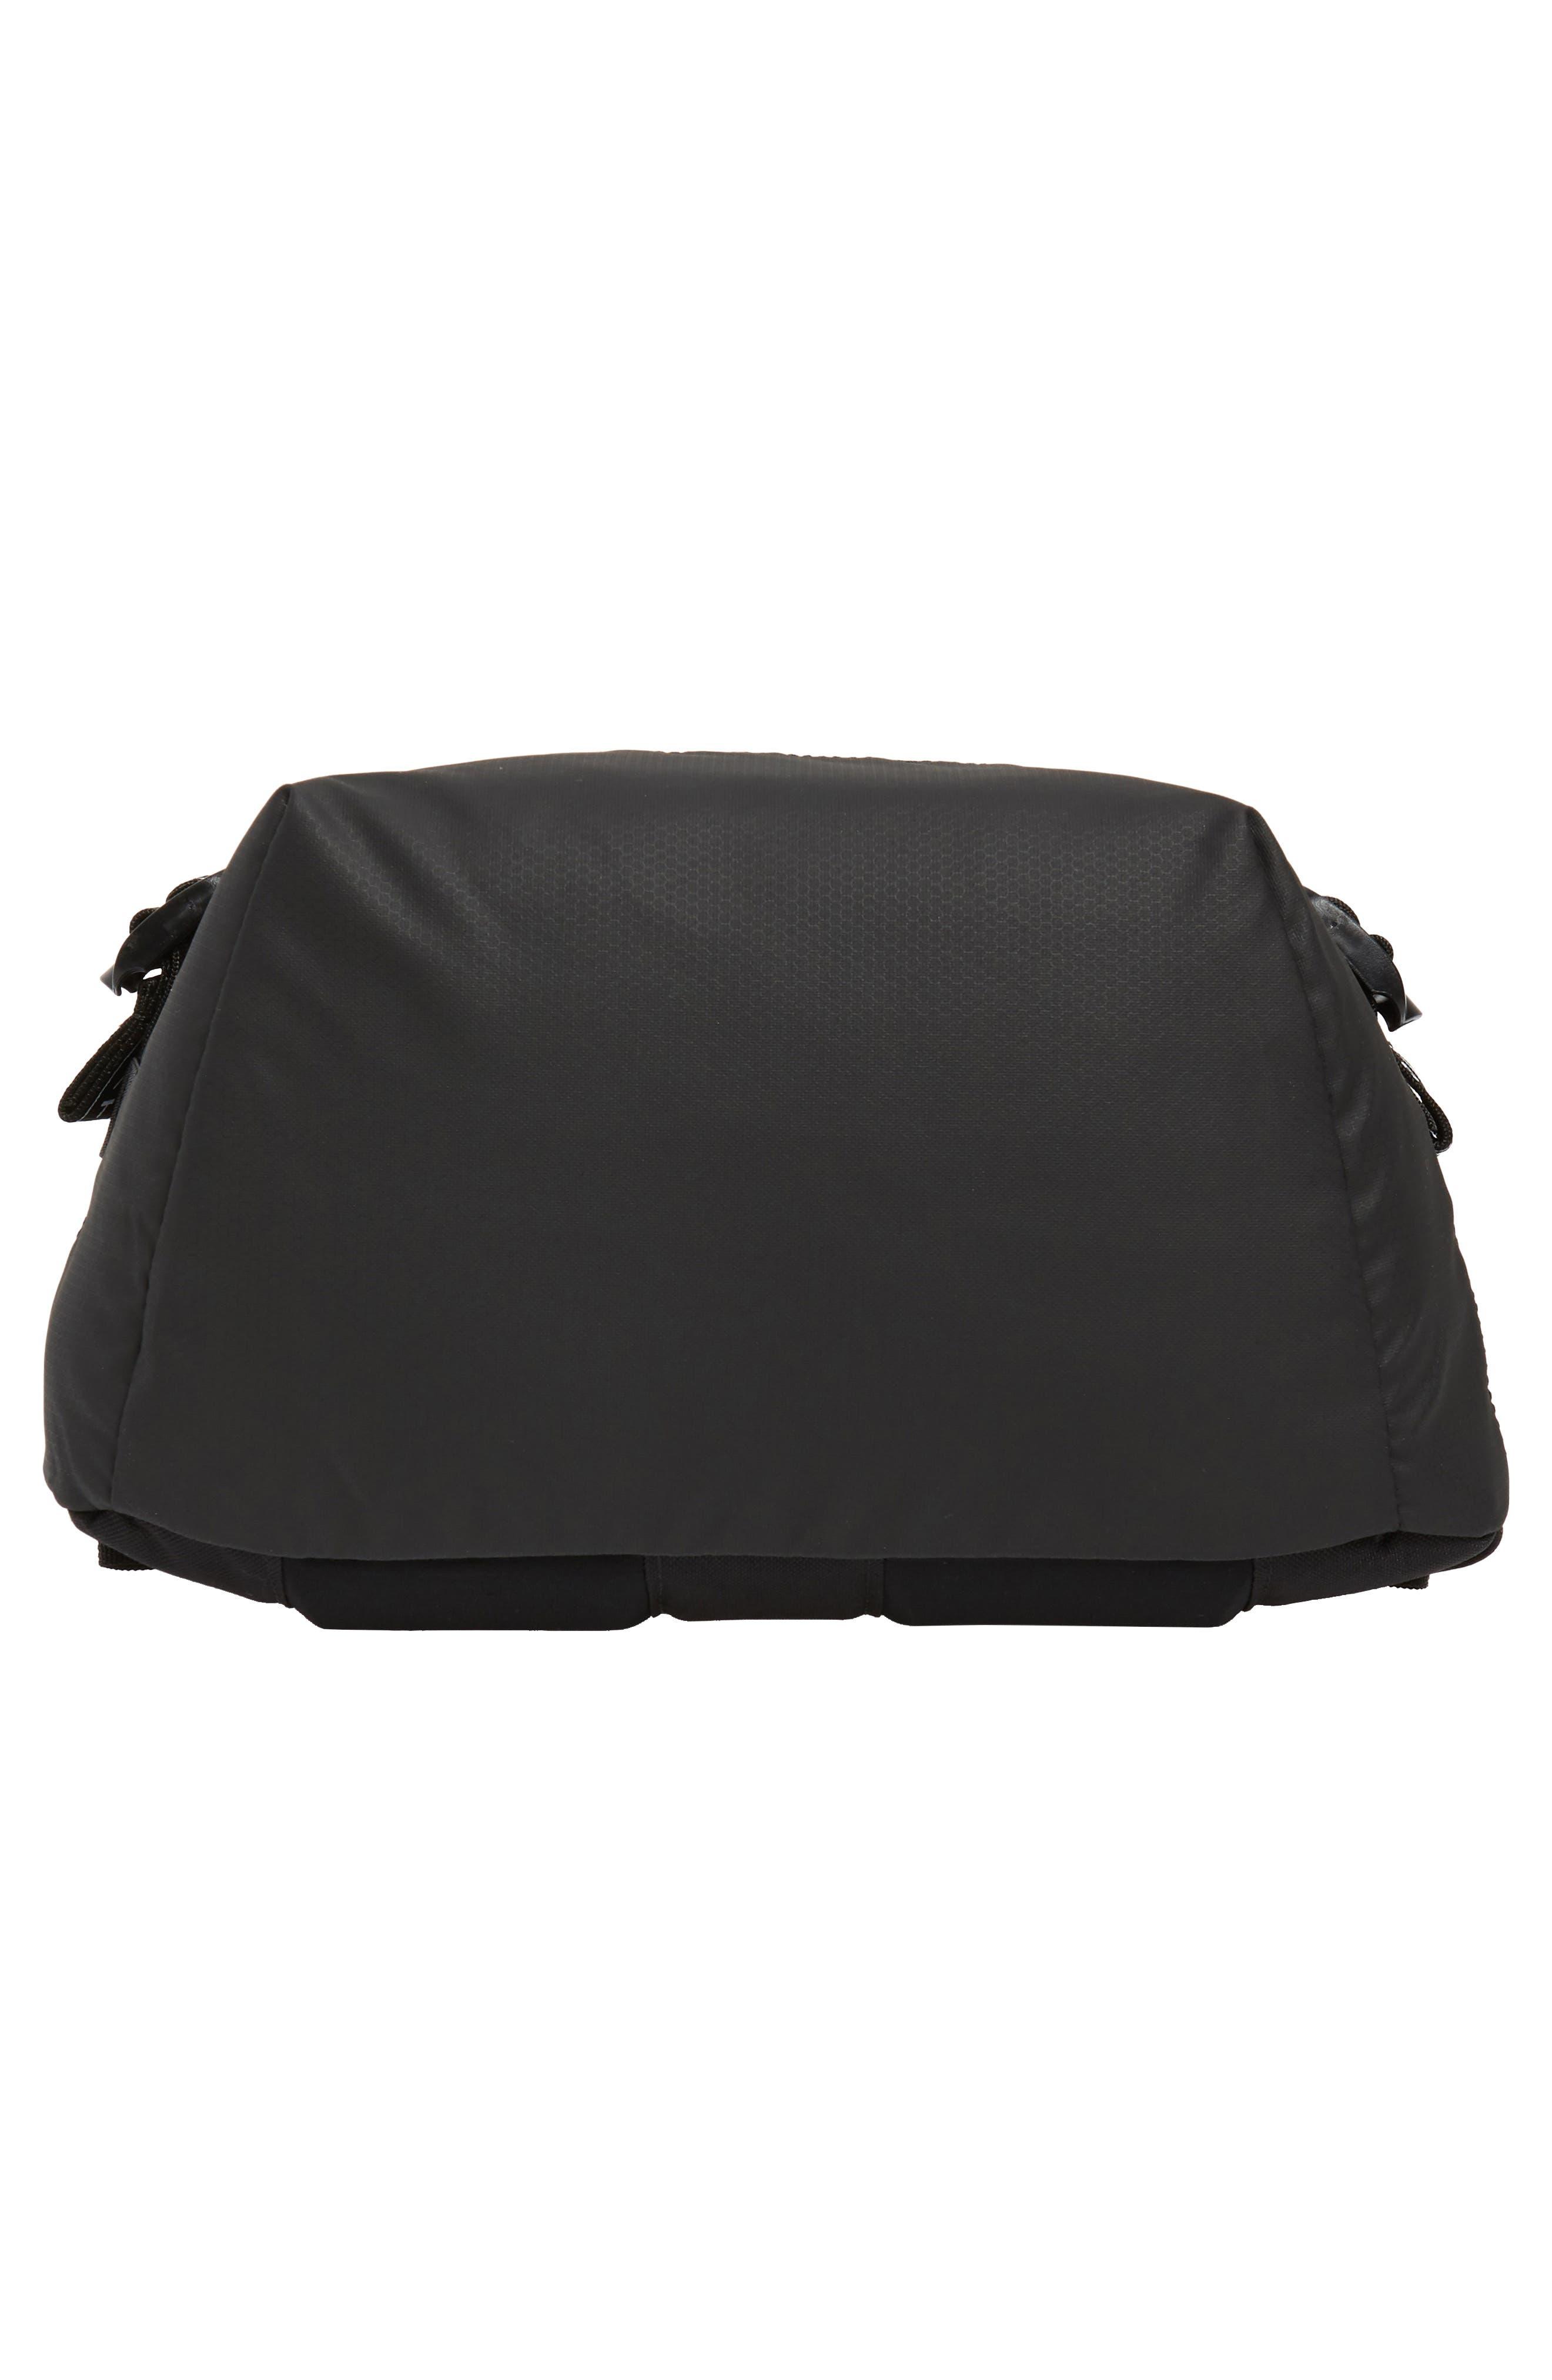 adidas NMD Backpack,                             Alternate thumbnail 6, color,                             BLACK